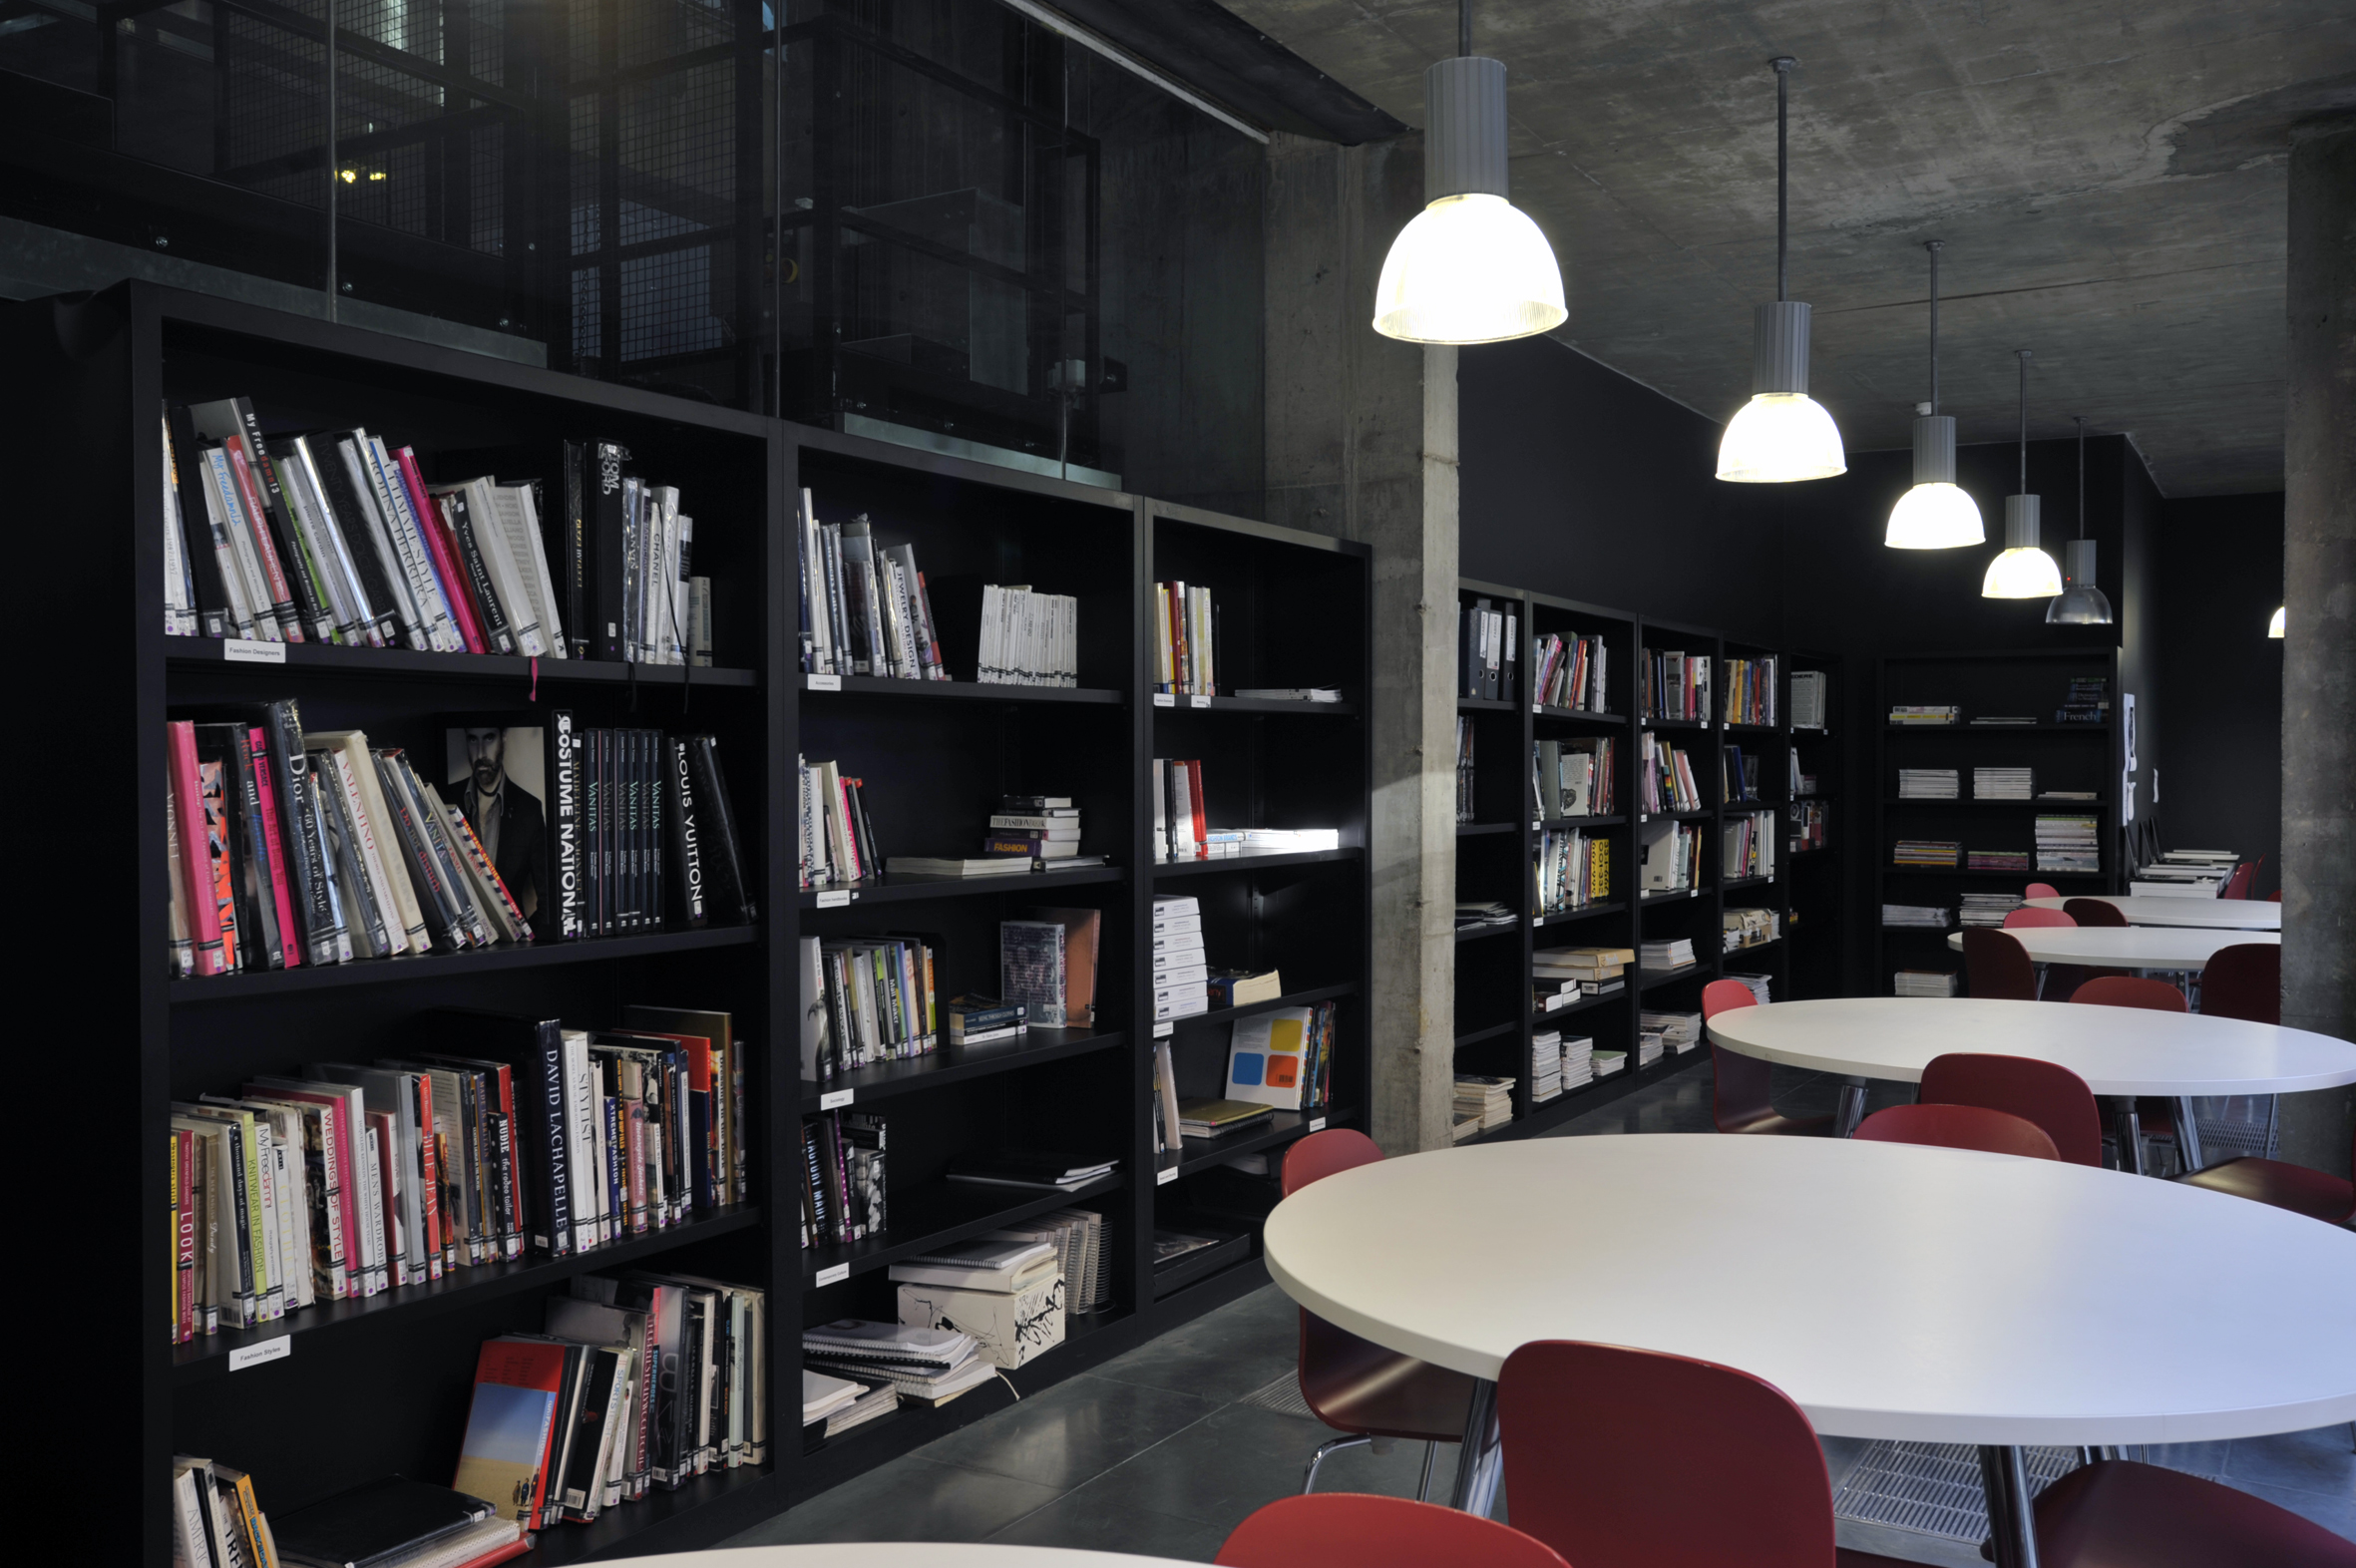 Study Abroad Istituto Marangoni